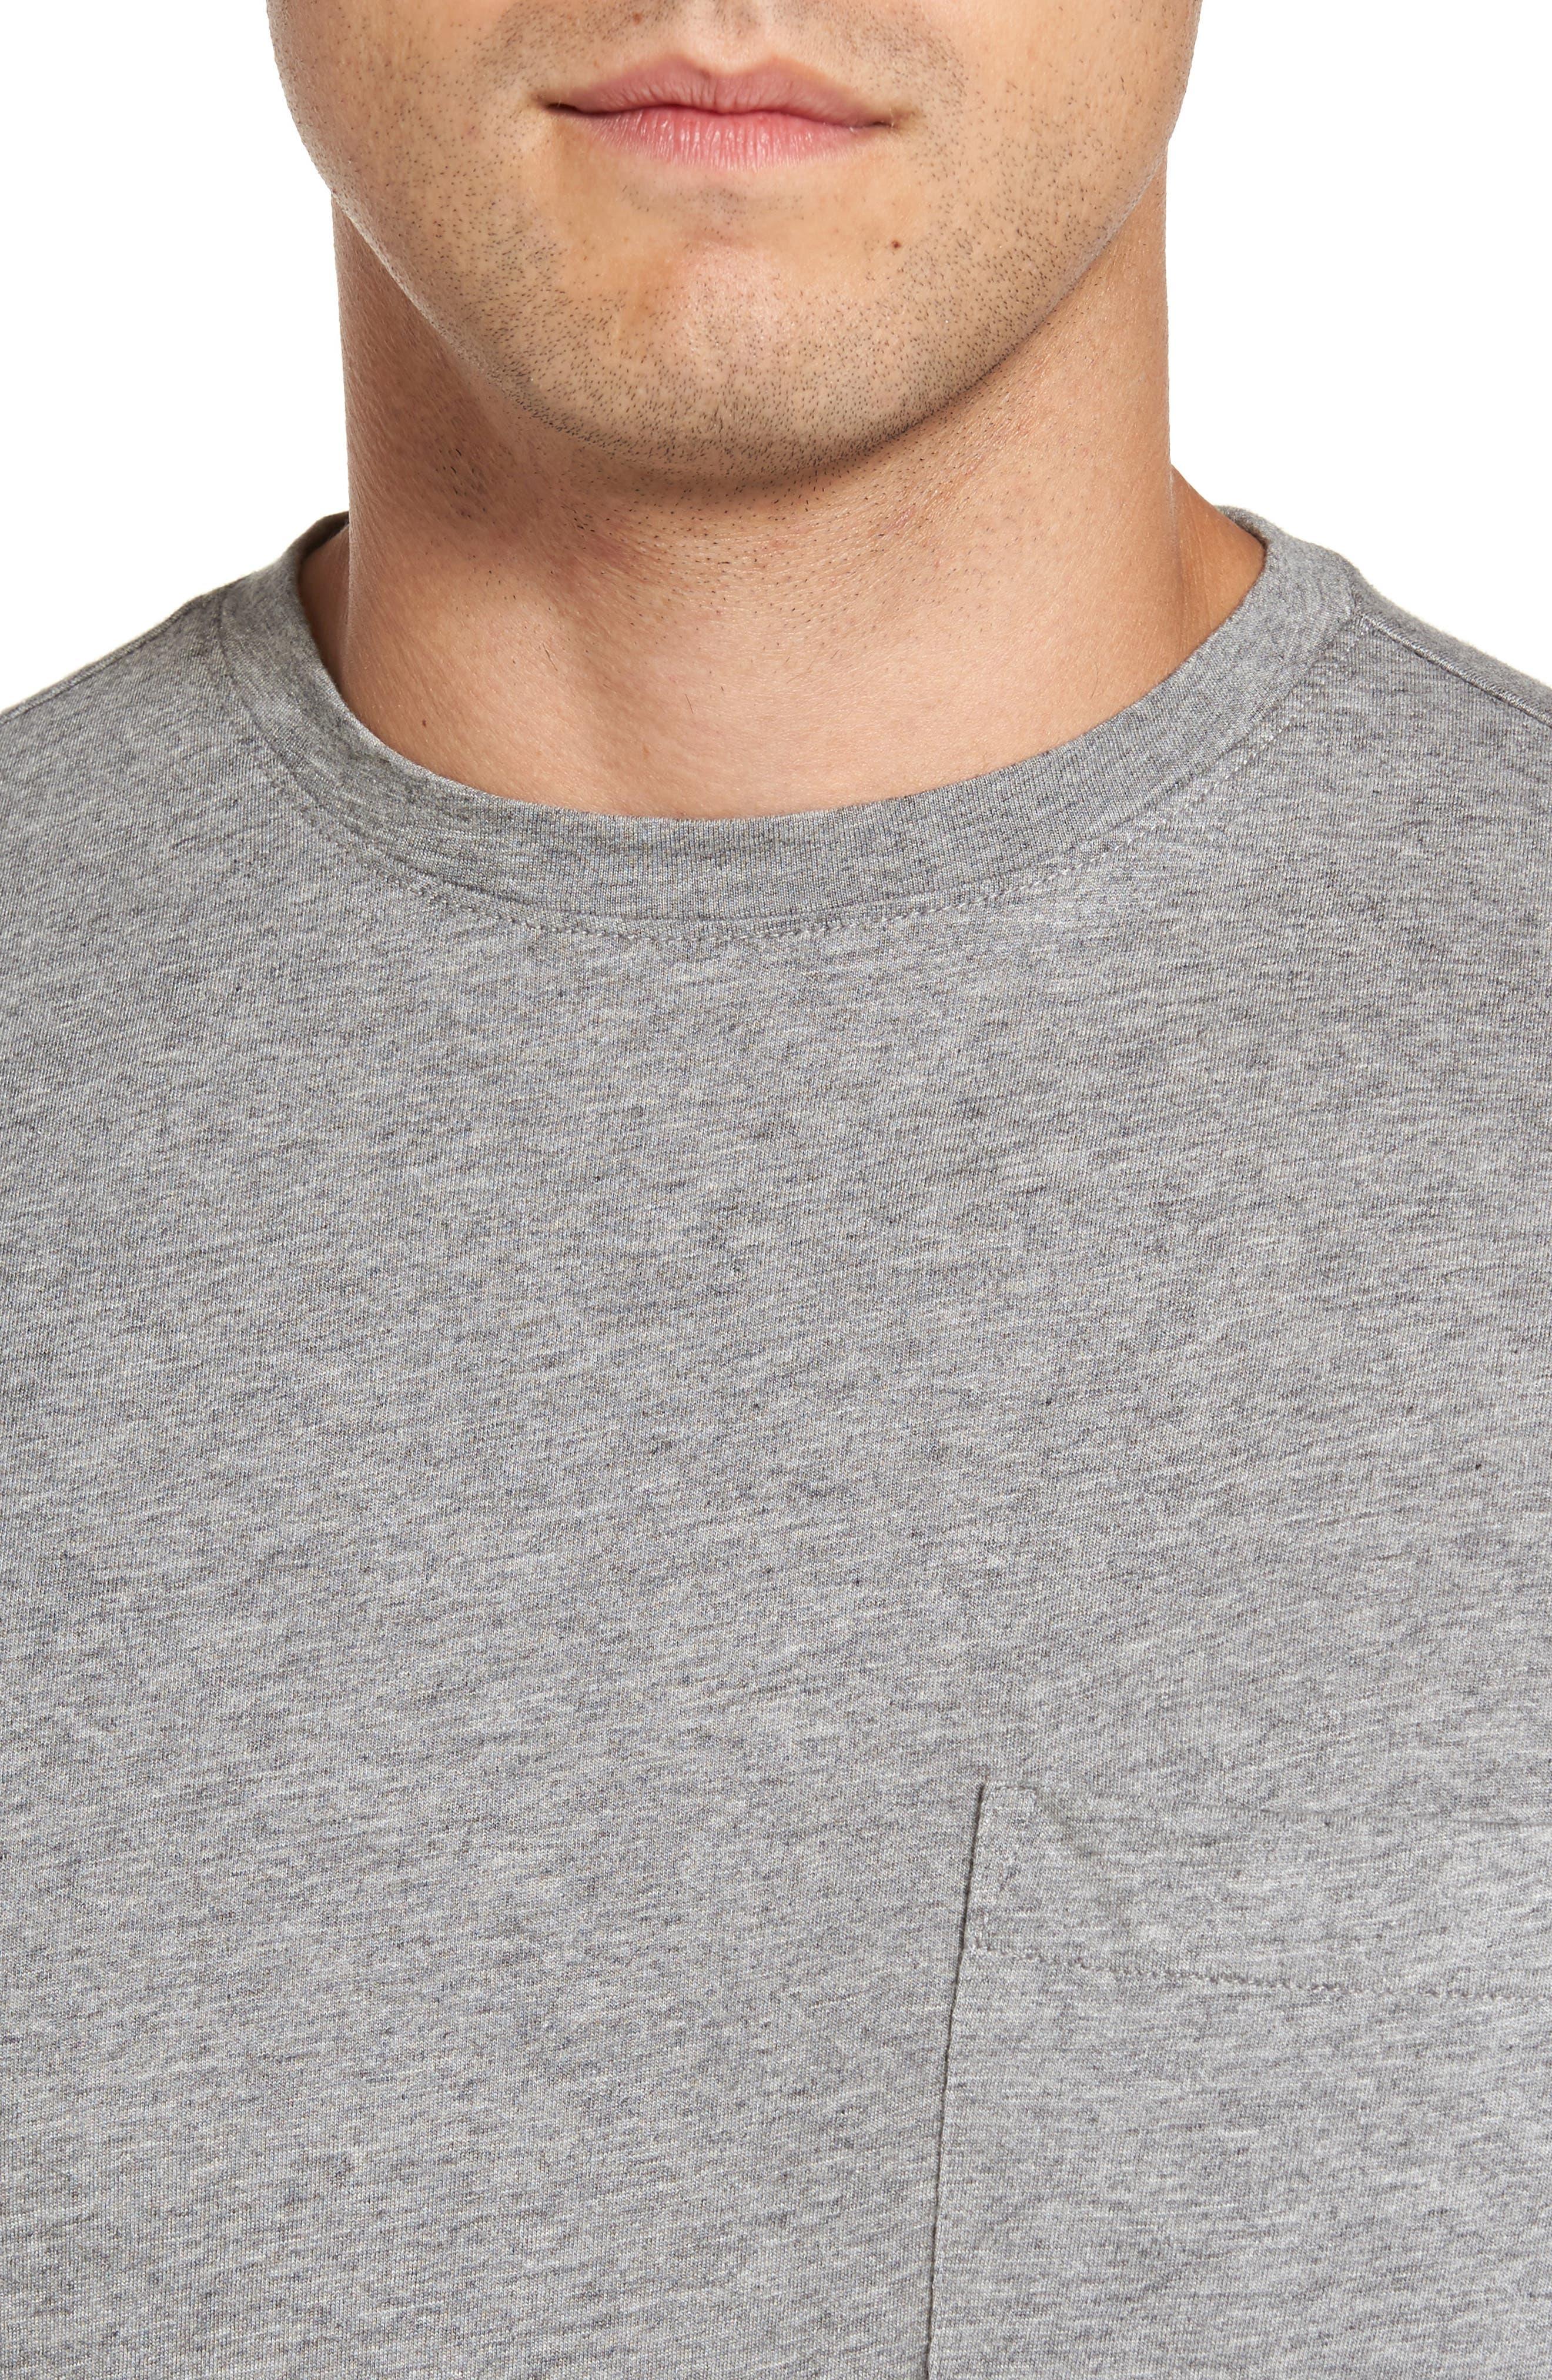 Crown Pocket T-Shirt,                             Alternate thumbnail 11, color,